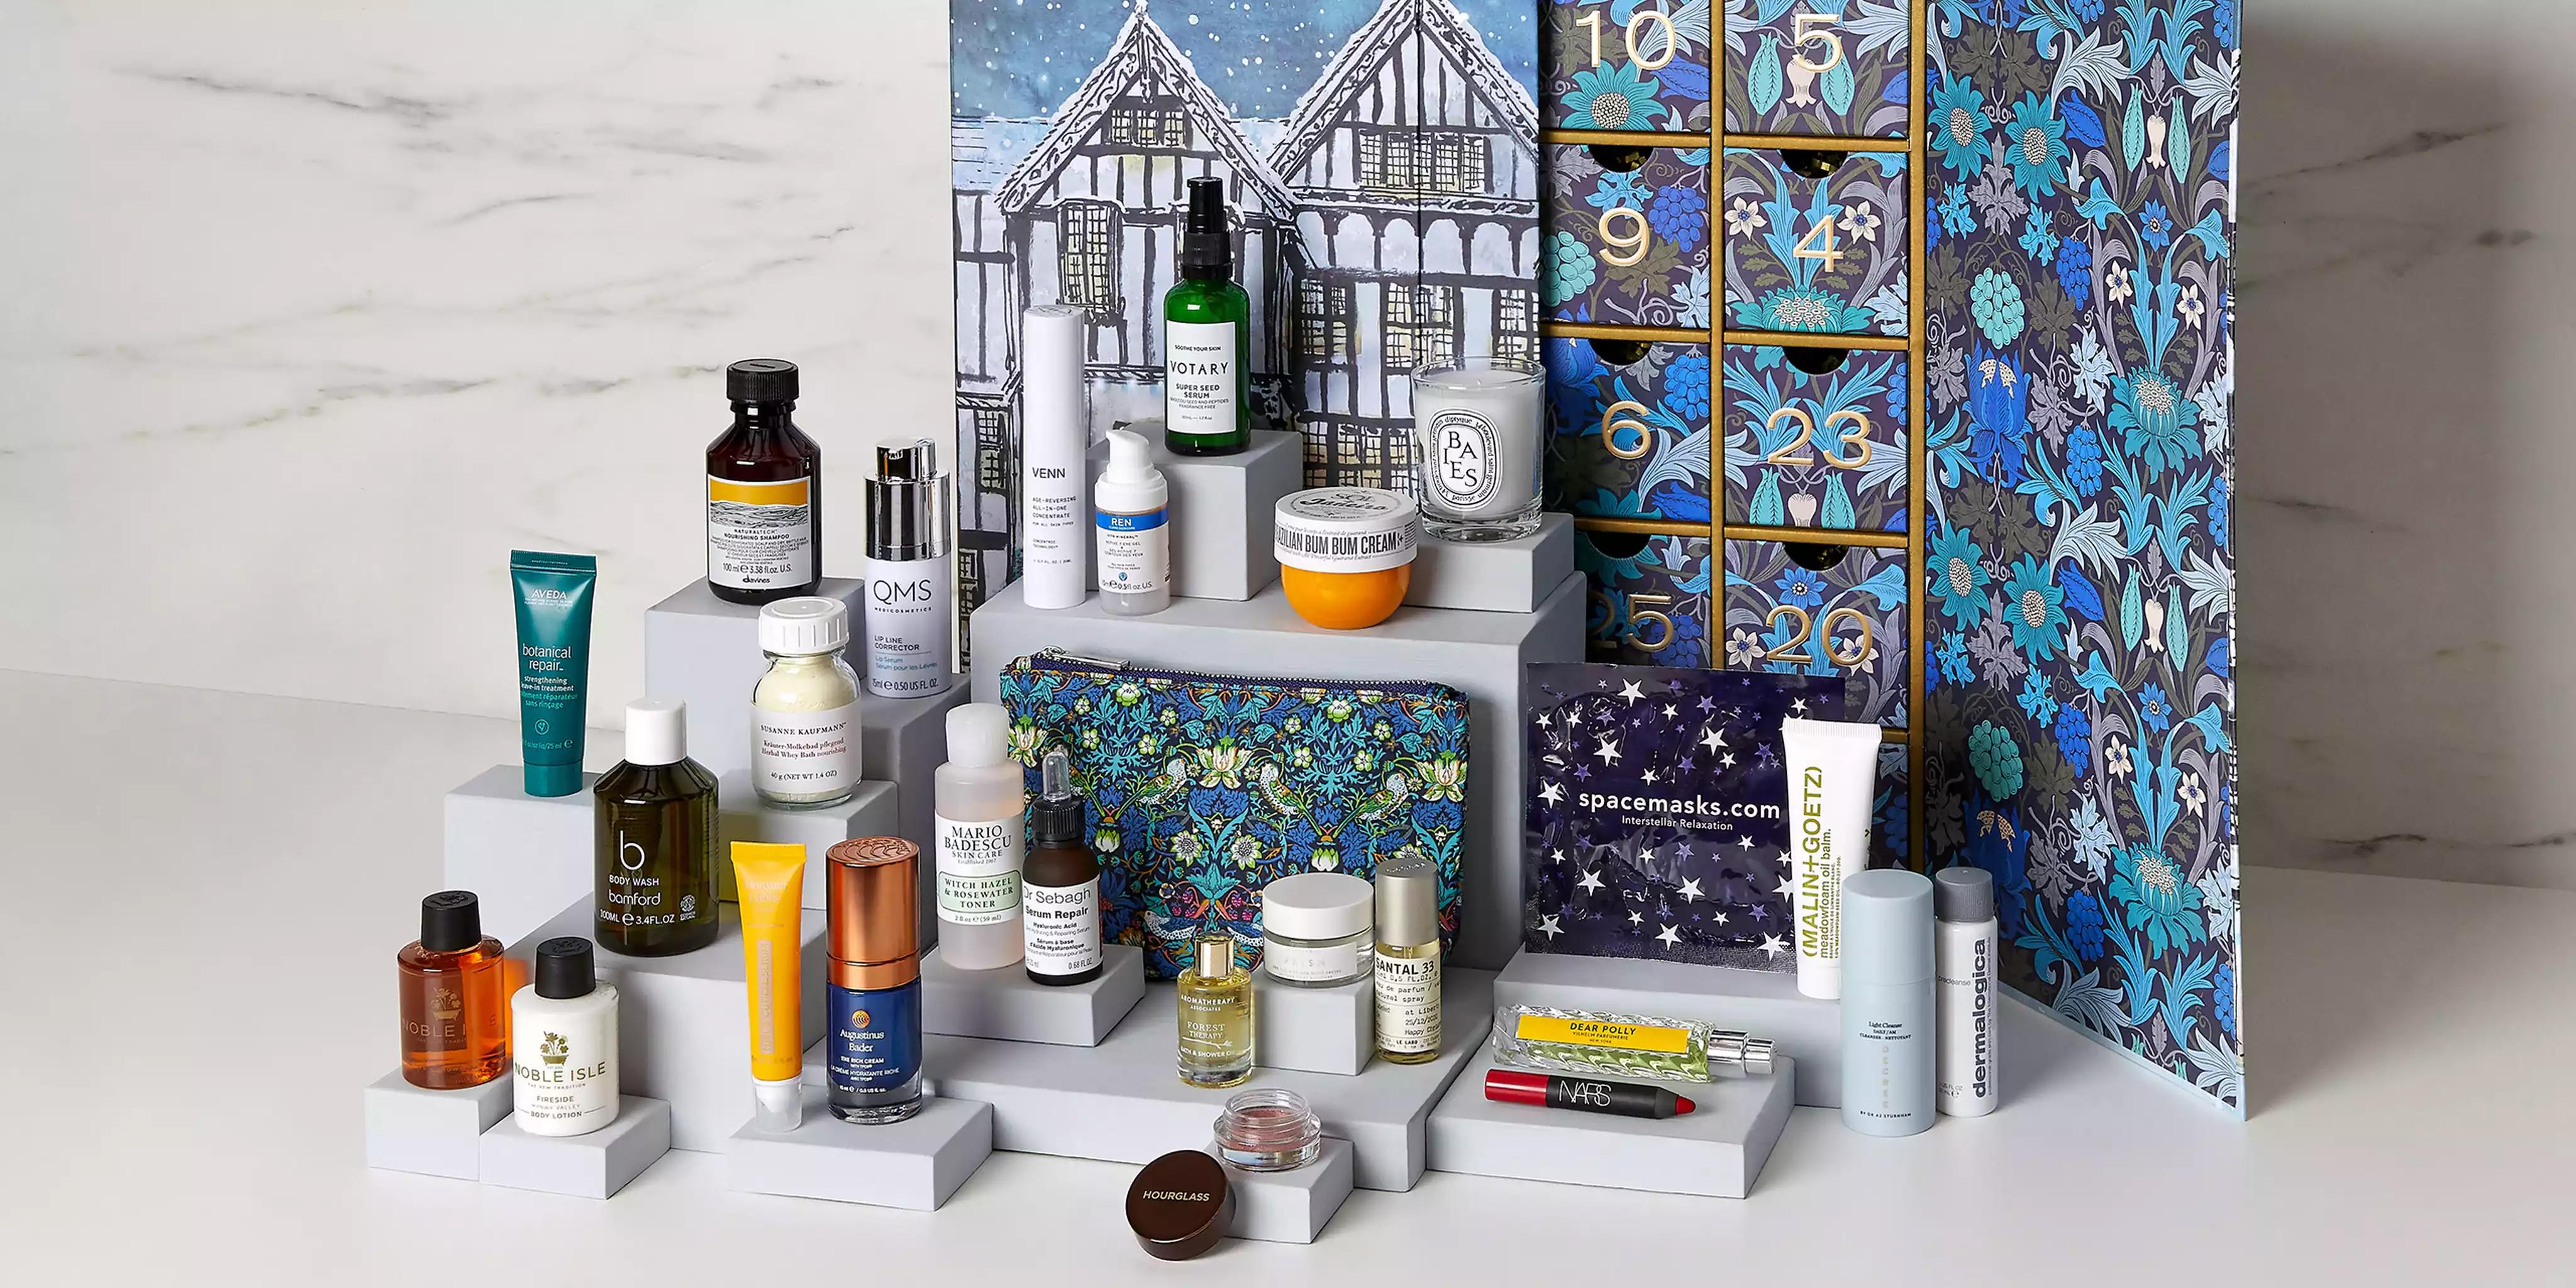 Best Beauty Advent Calendars 2020 Premium Advent Calendars From Designer Brands T3